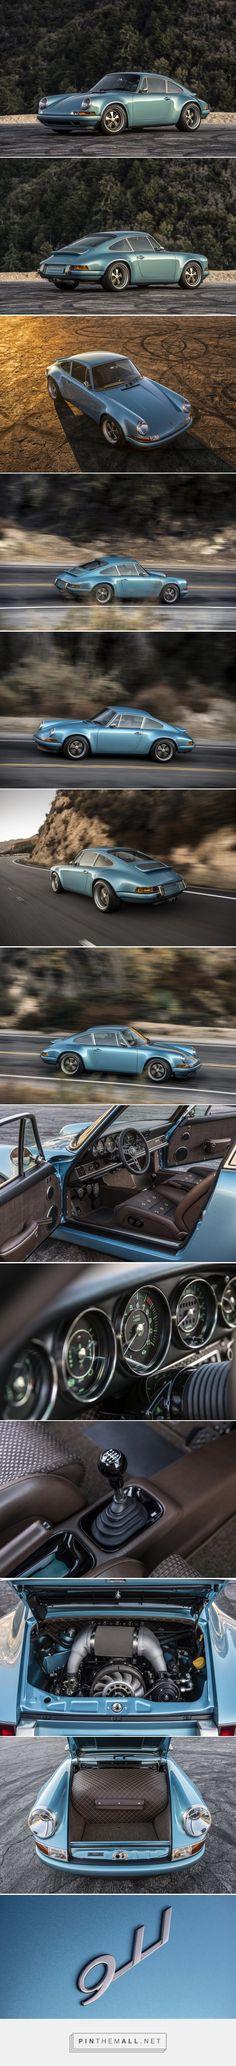 This Restomod Porsche 911 Is Cooler Than Cool